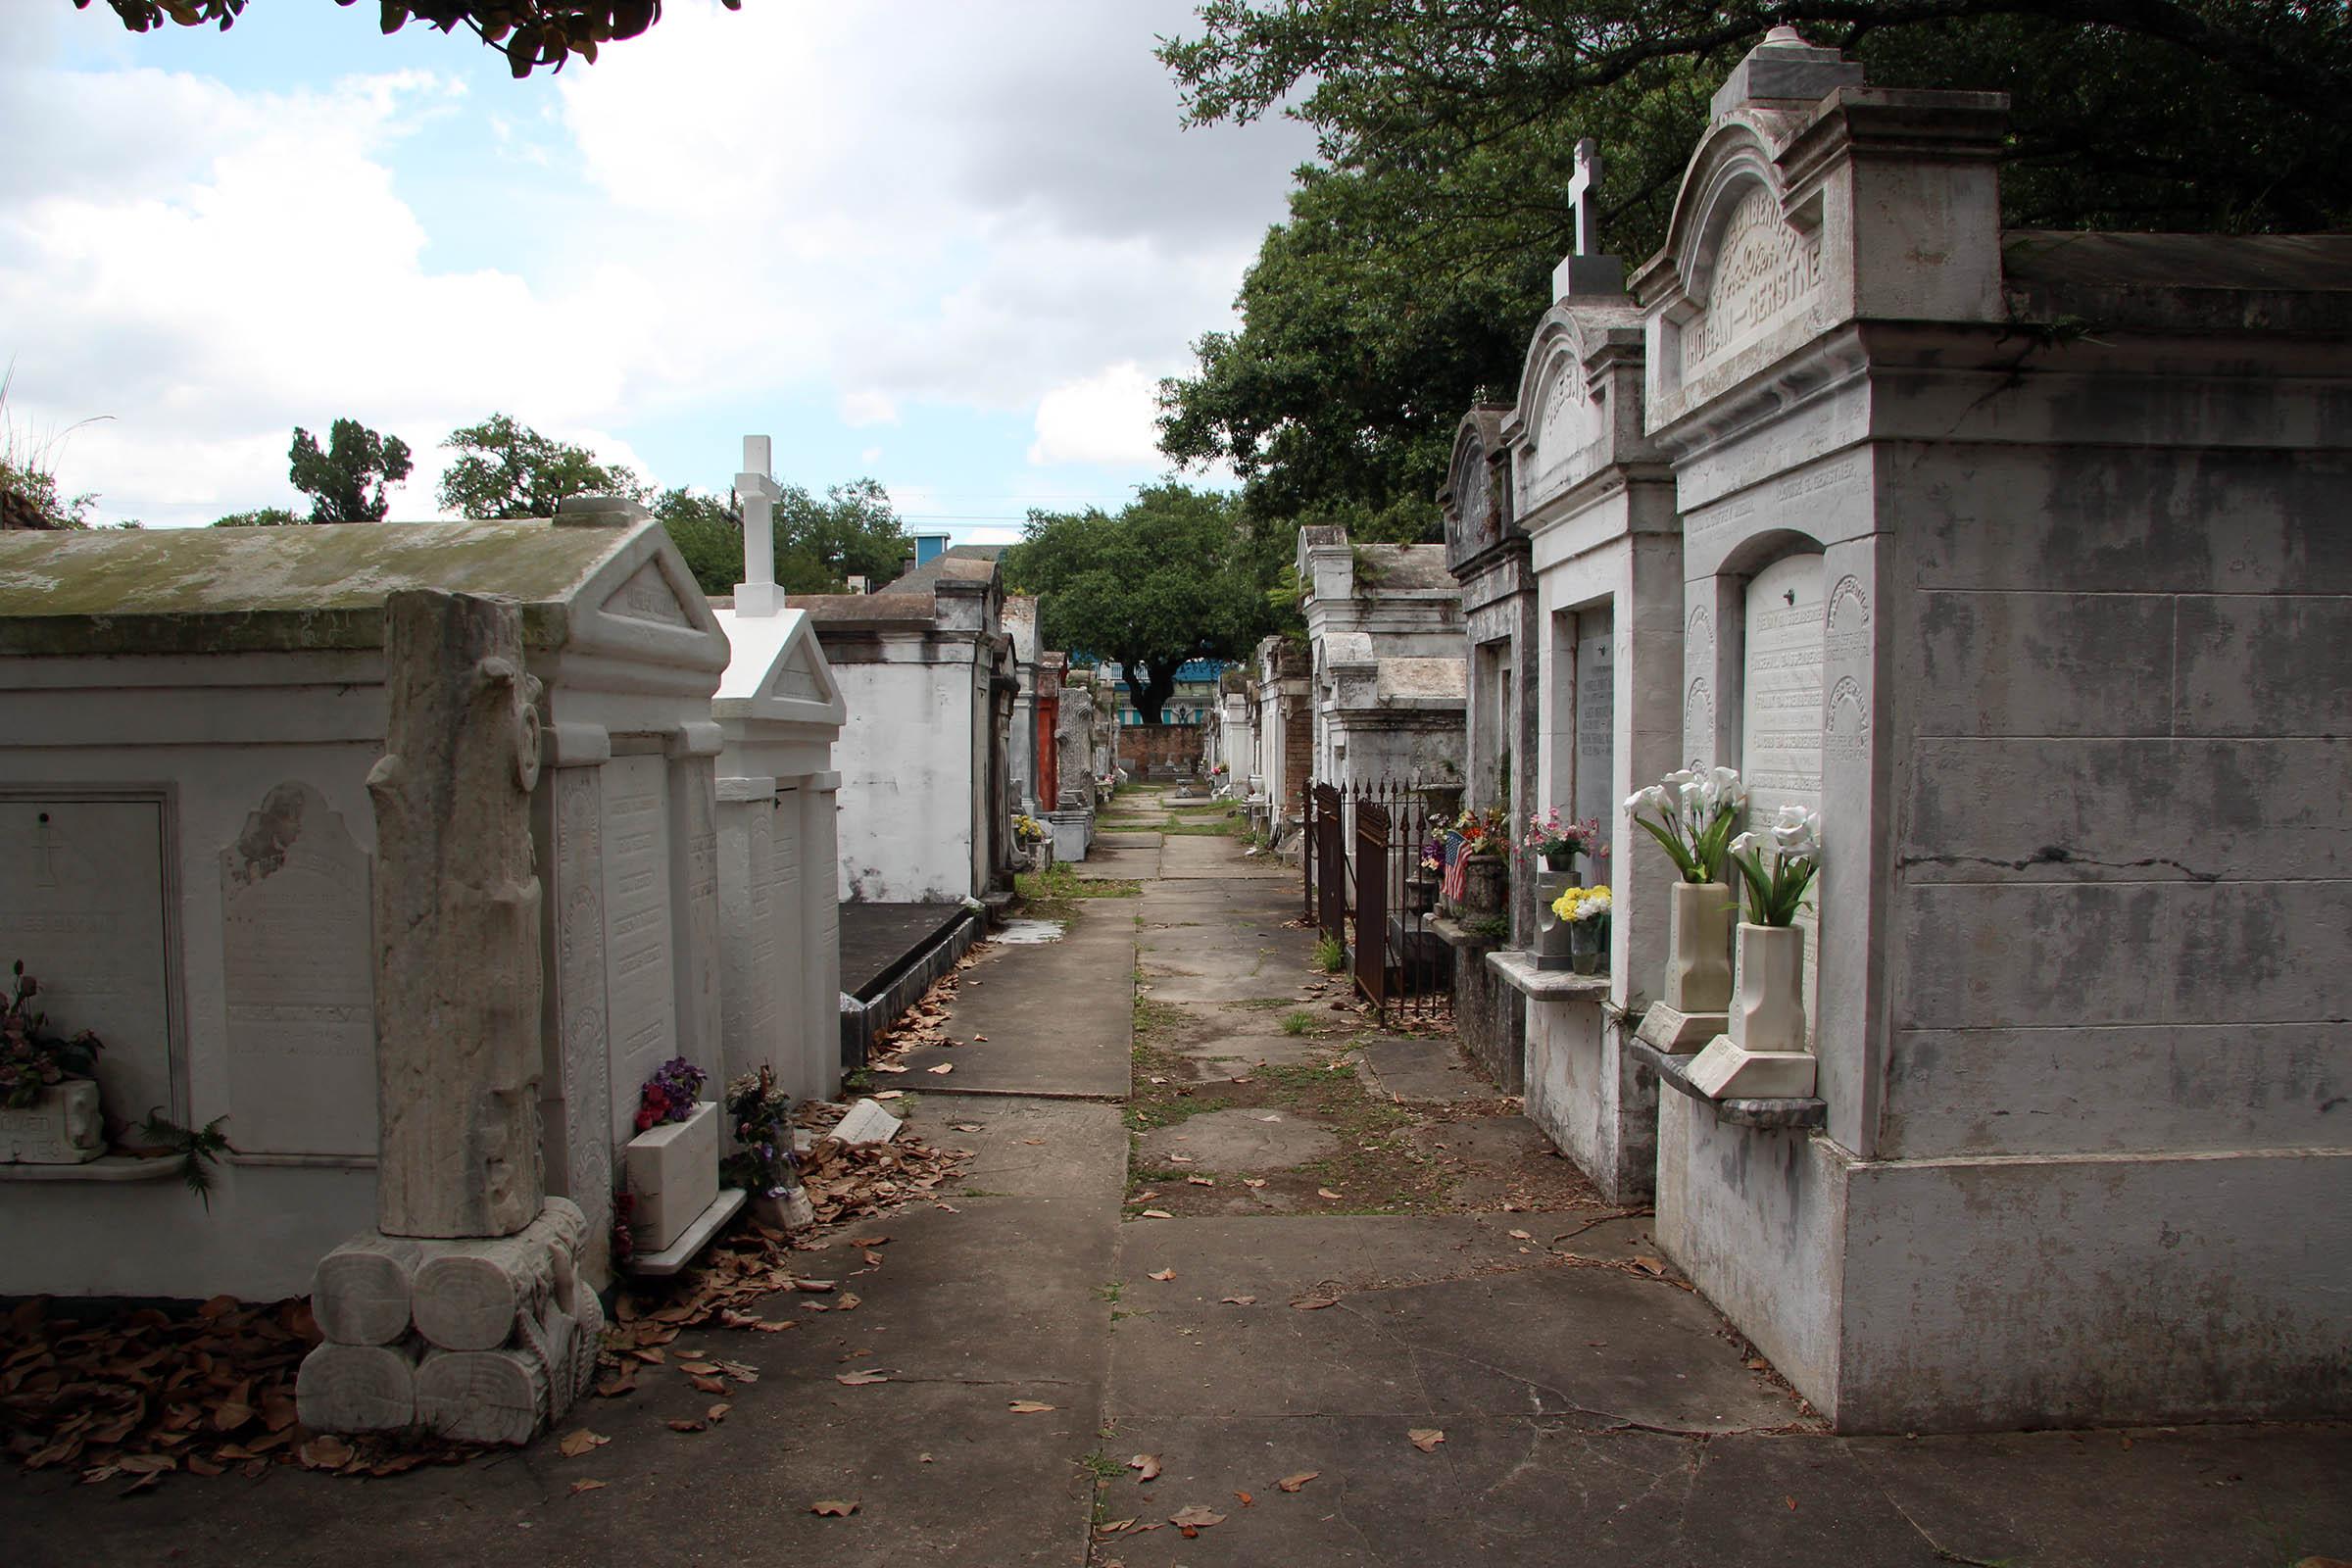 Lafayette Cemetery, New Orleans, LA, USA, 2013.